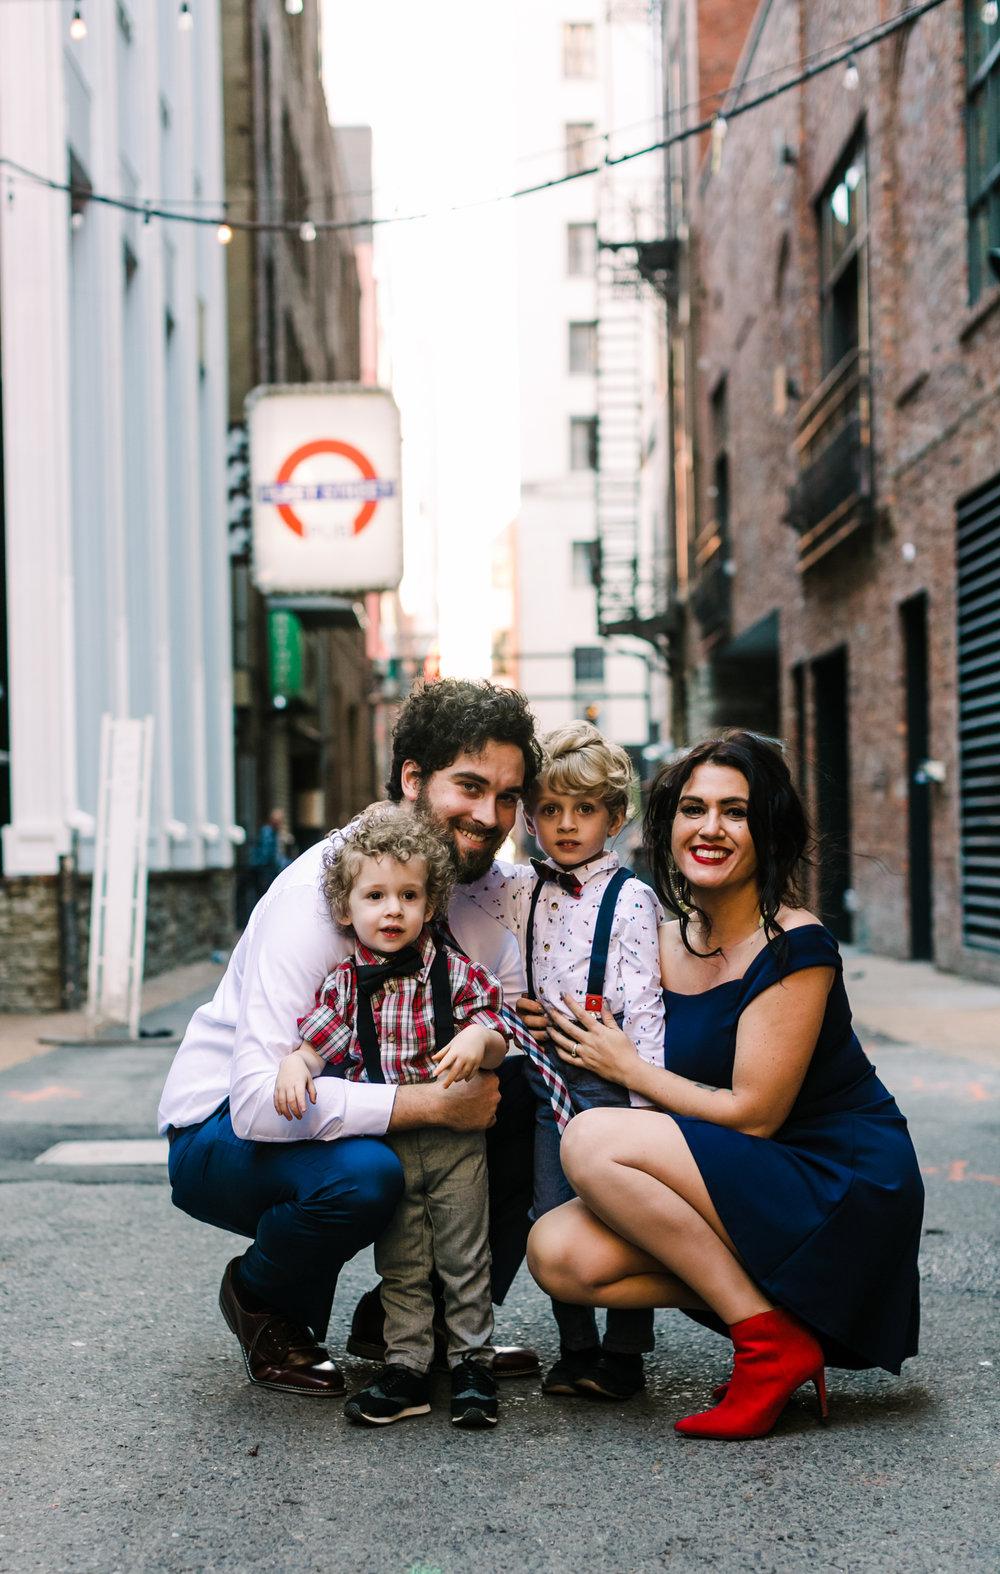 printers+alley+nashville+family+photos (4 of 19).jpg